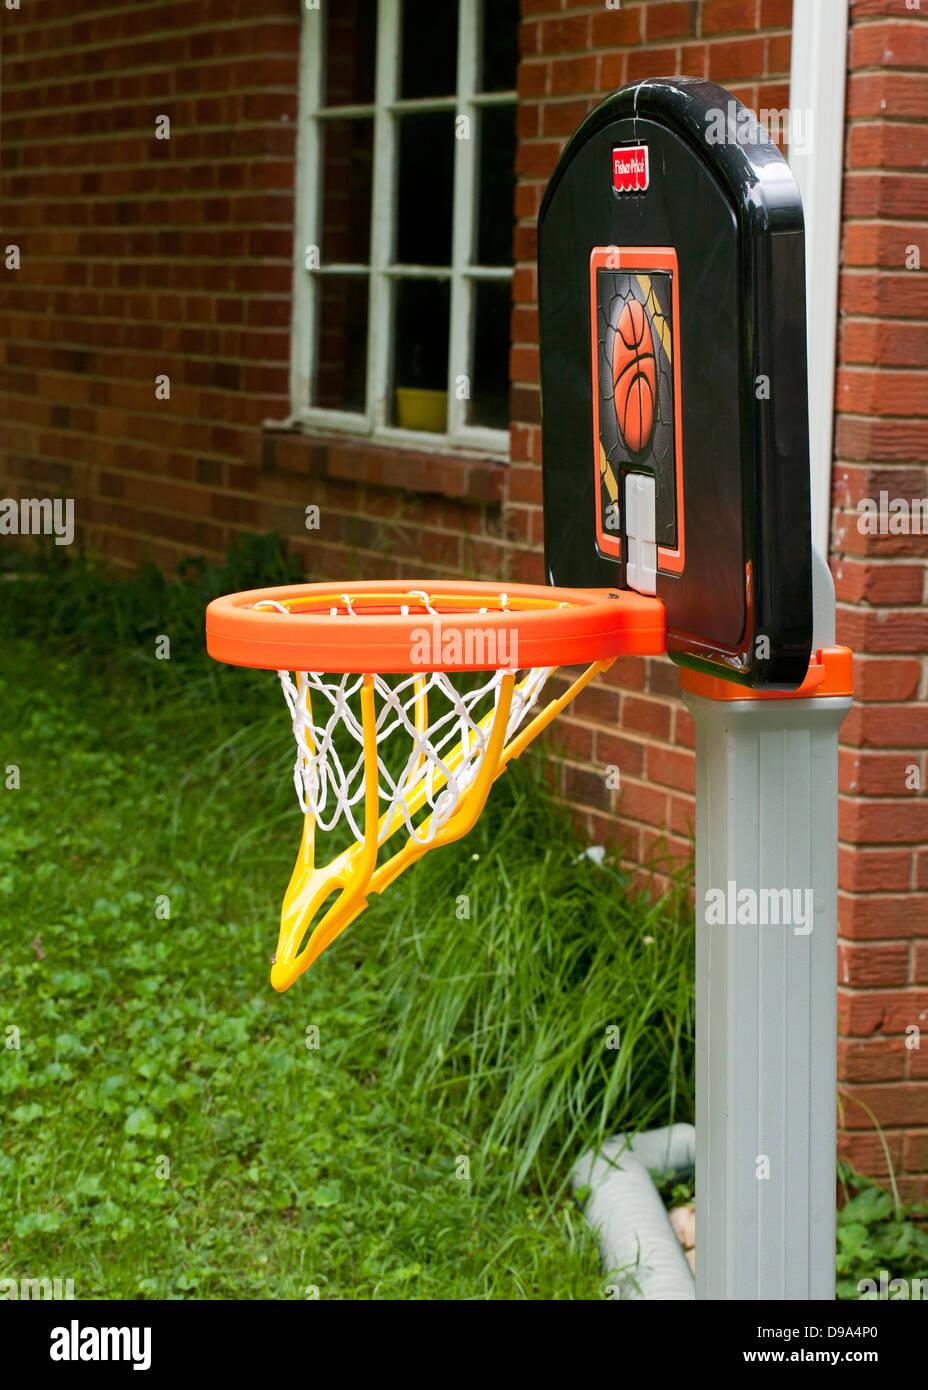 Children's basketball hoop - Stock Image